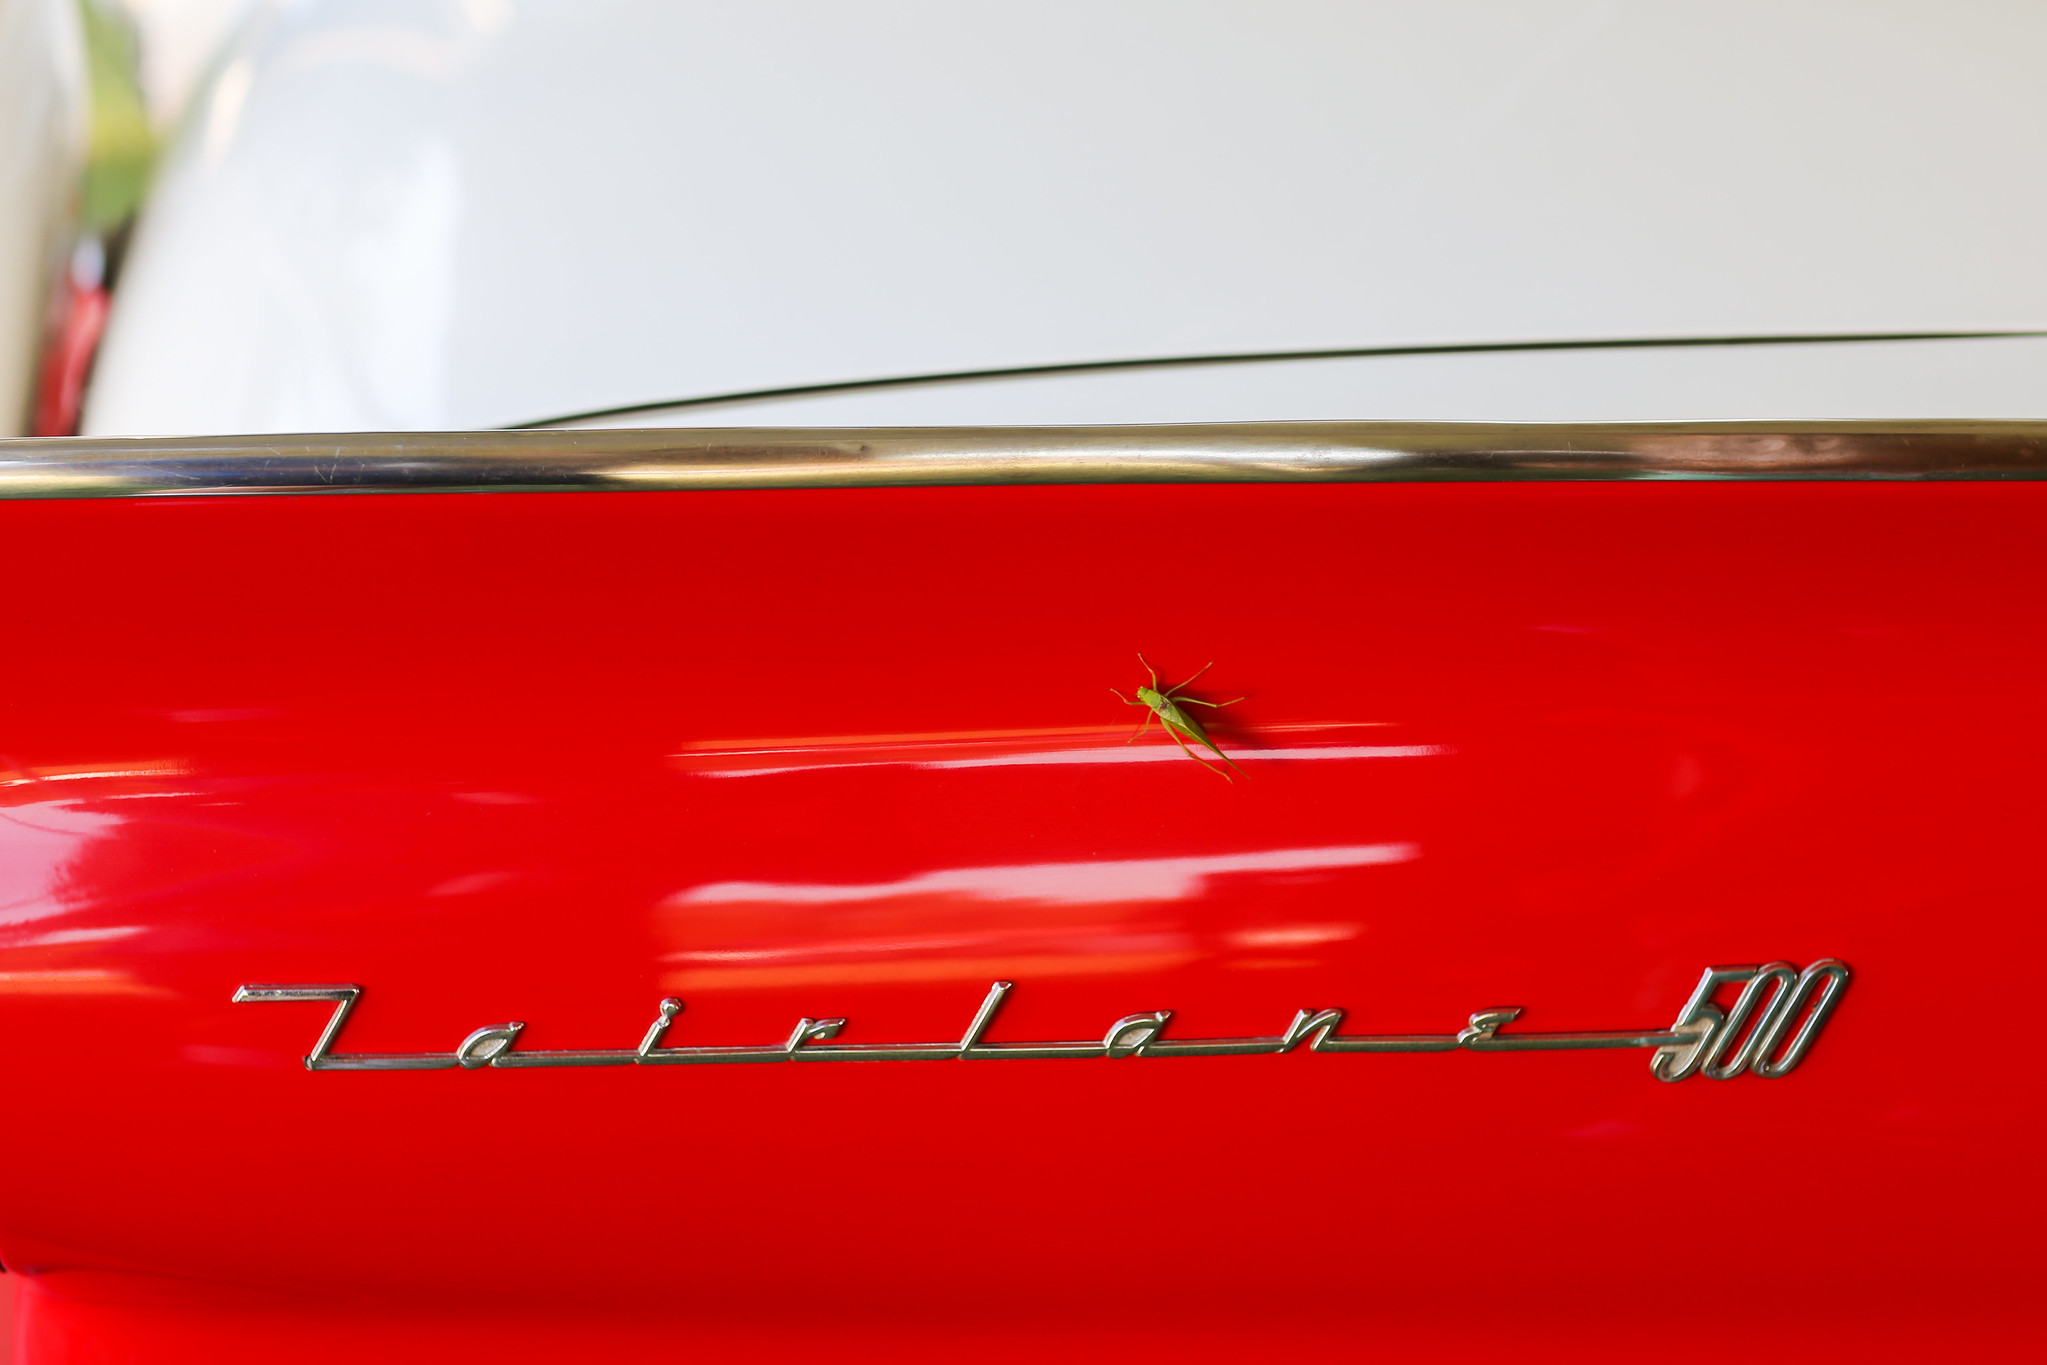 Fairlane 500 with katydid